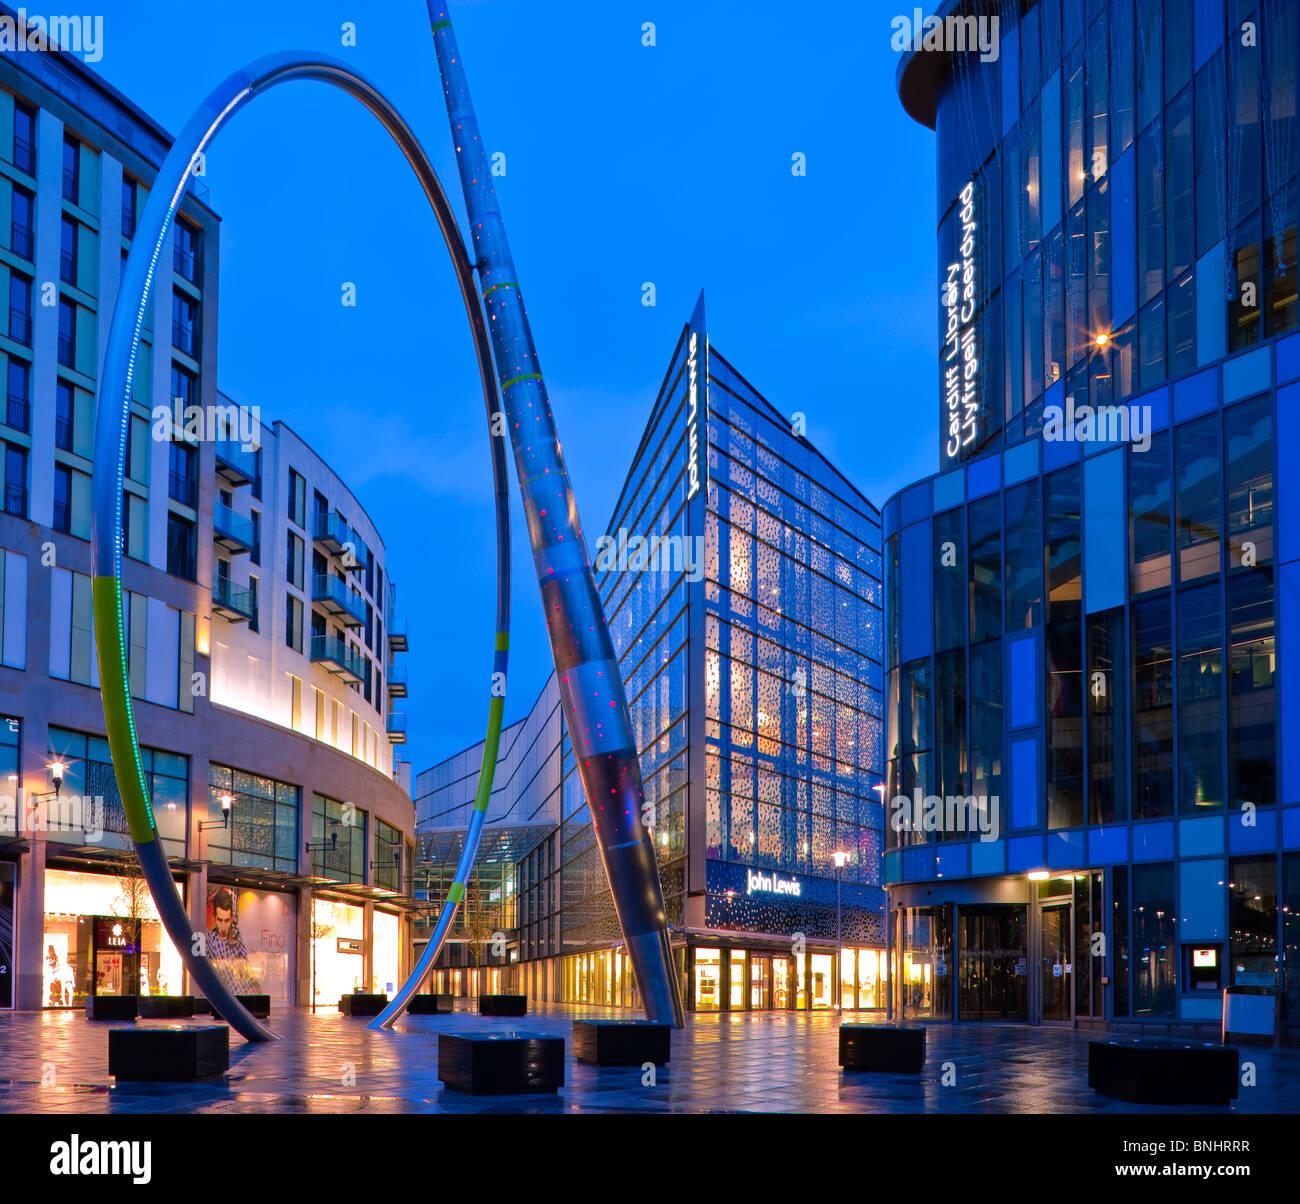 Almacenes John Lewis Shopping Center y la Biblioteca Central de Cardiff Gales en penumbra Imagen De Stock